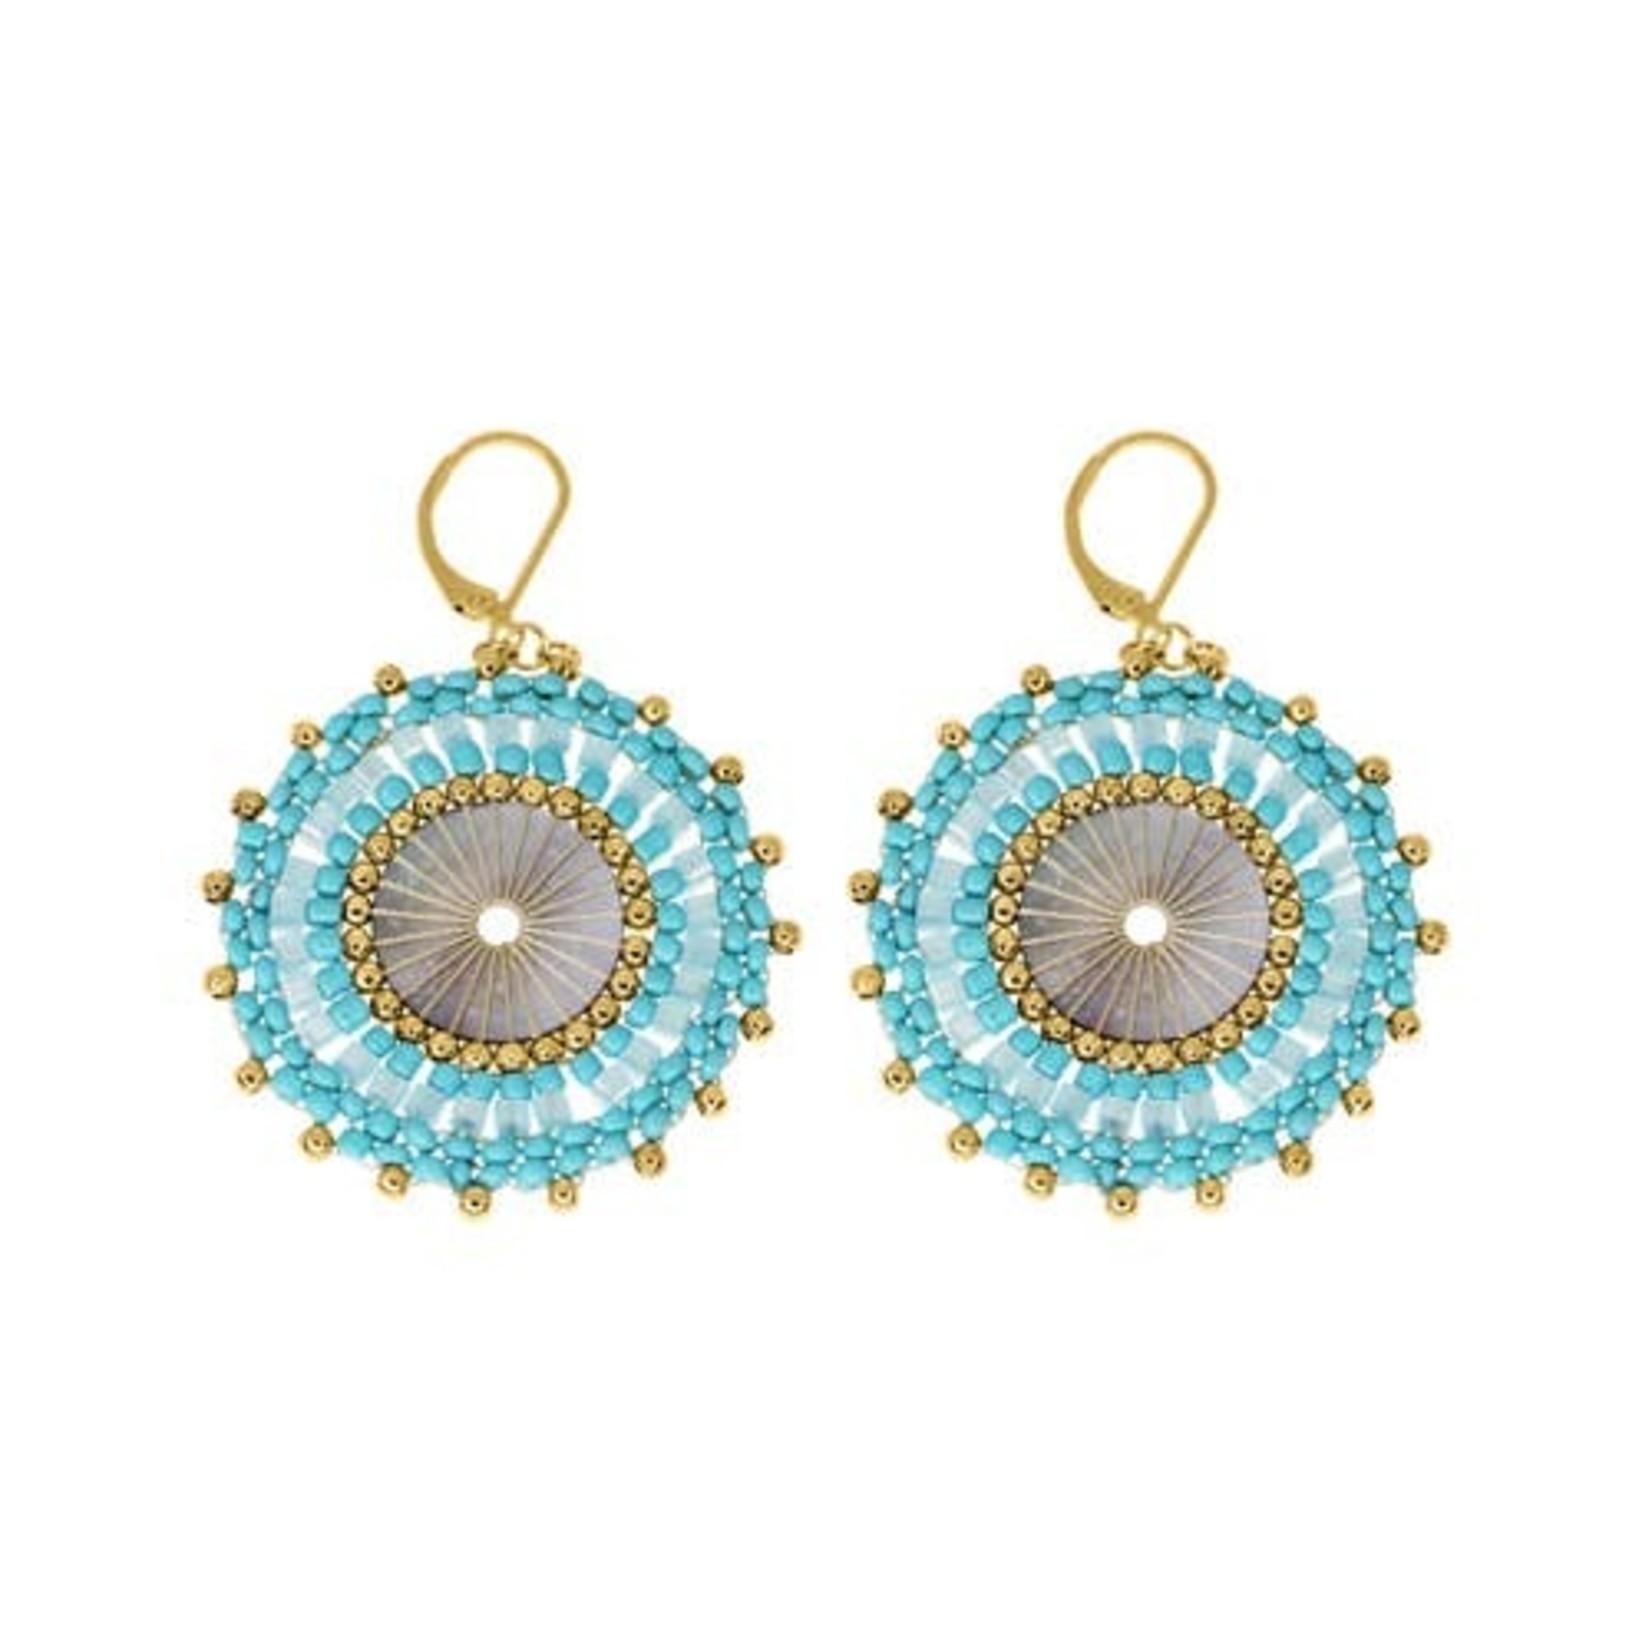 Turquoise & Gold Beaded Disc Earrings